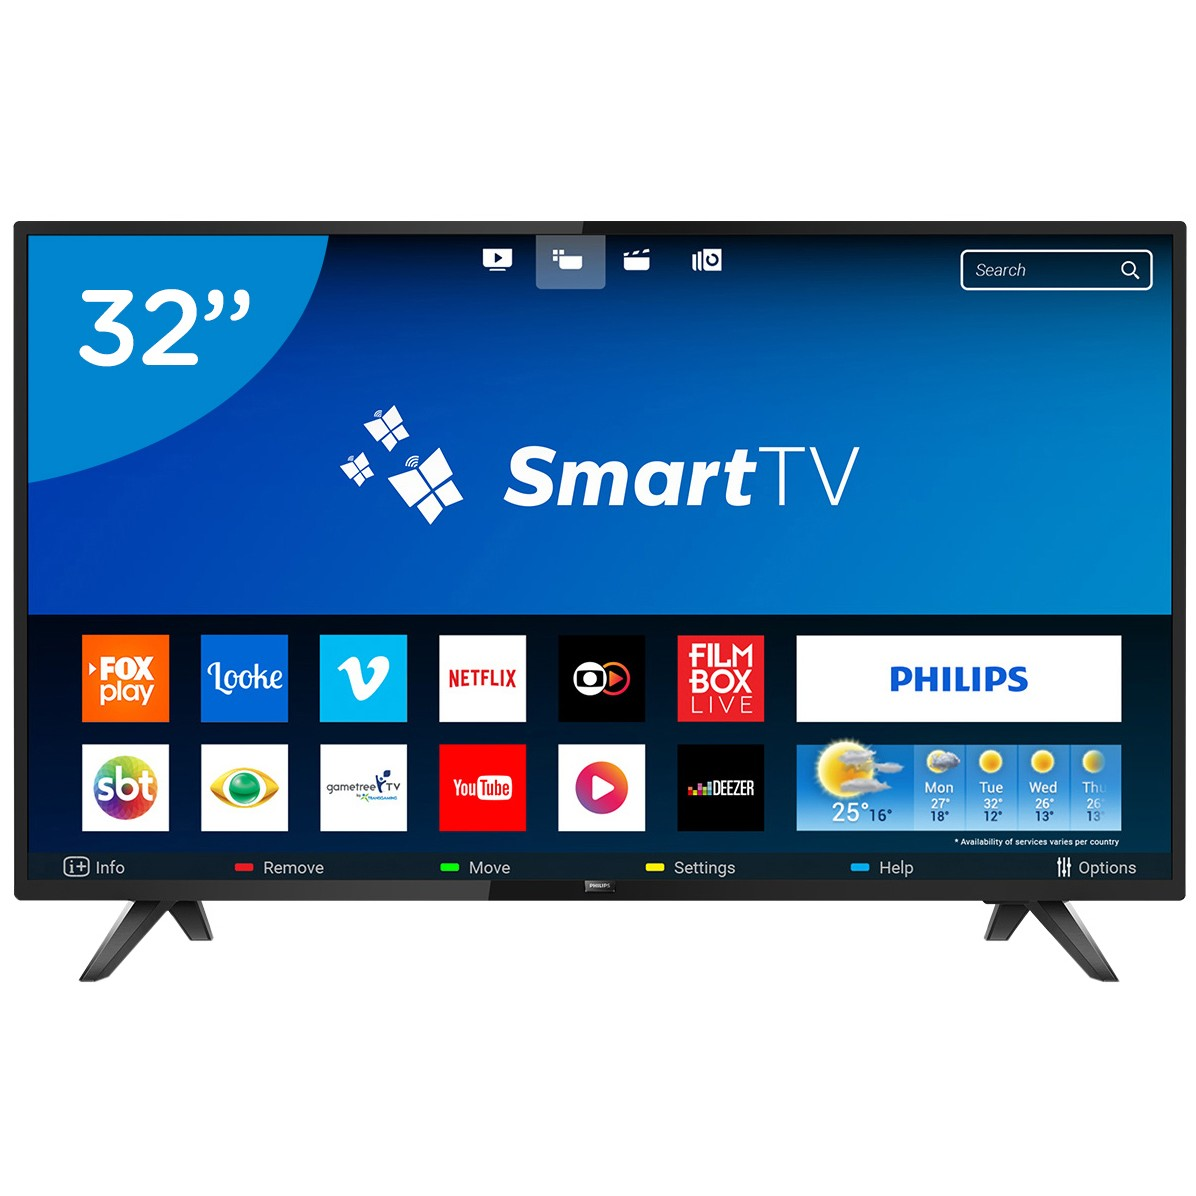 Smart TV LED 32 Philips HD Wi-Fi 2 HDMI 2 USB - 32PHG581378